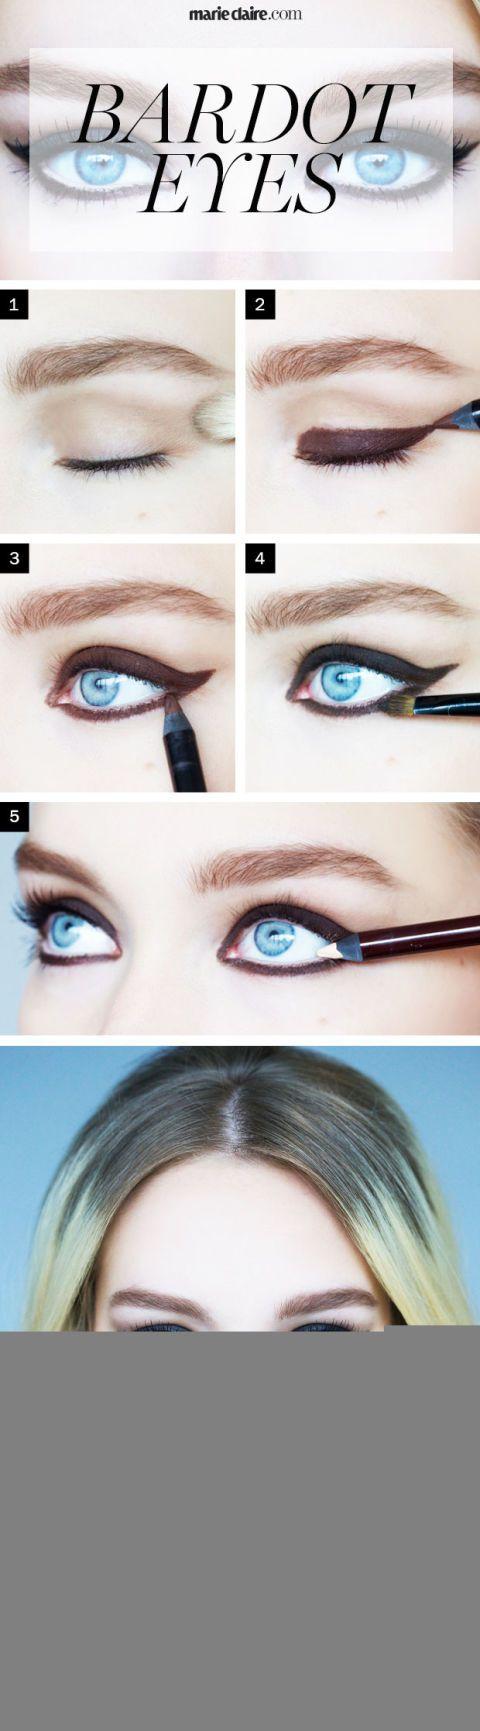 Makeup How To Brigitte Bardot Eye Makeup